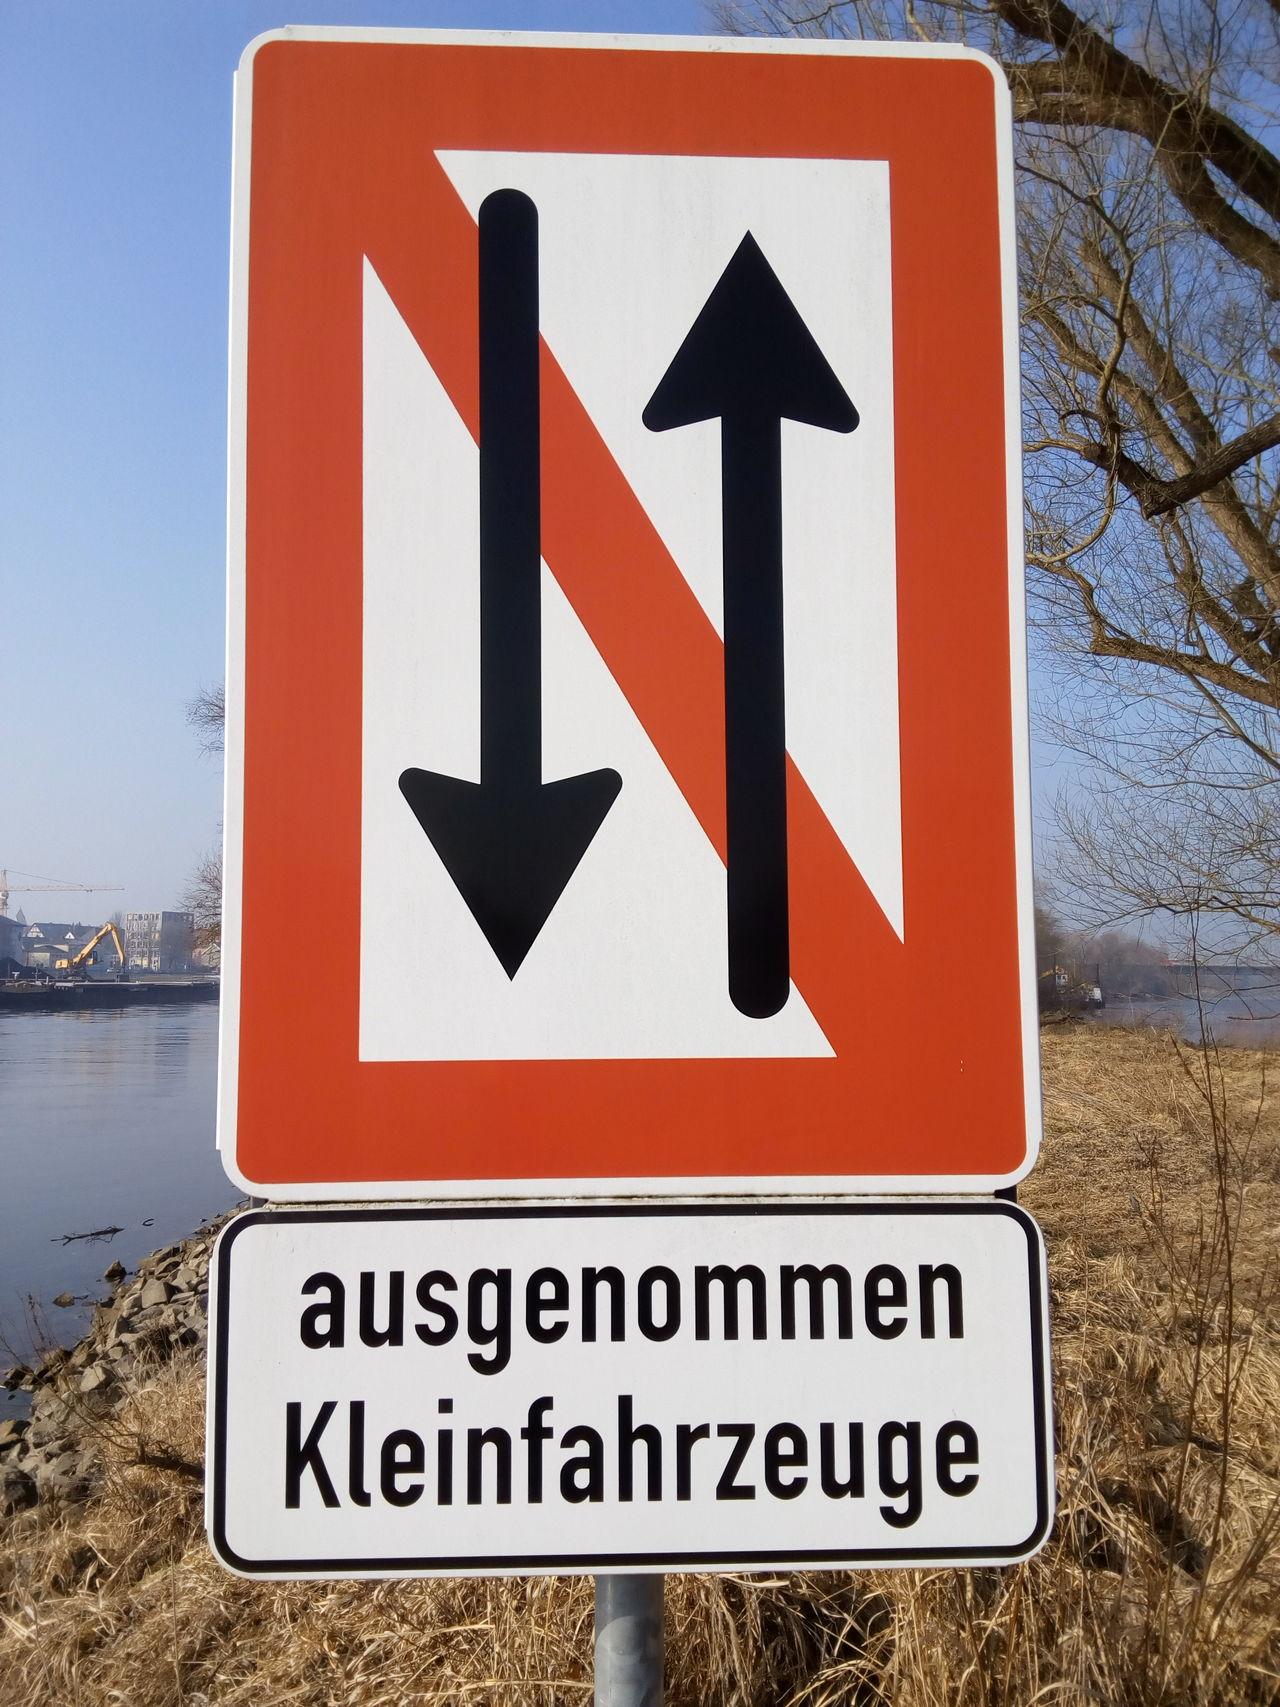 Warning Sign Road Sign Traffic Verkehrszeichen Verkehrsschild Schild